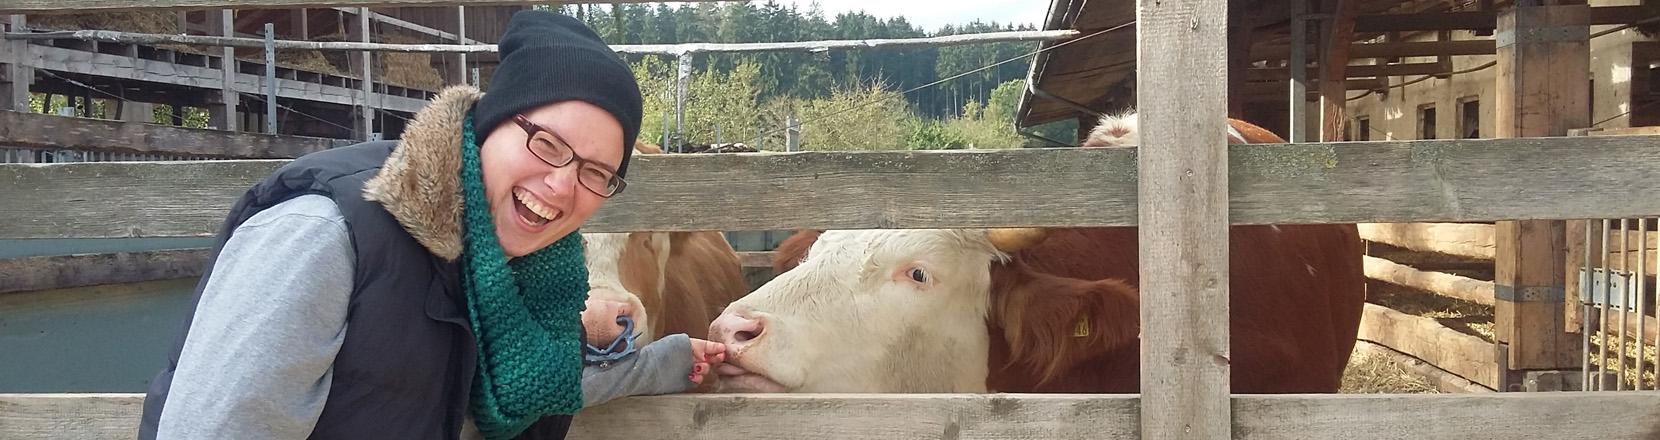 Landwirtin Julia Gillner vor Kühen